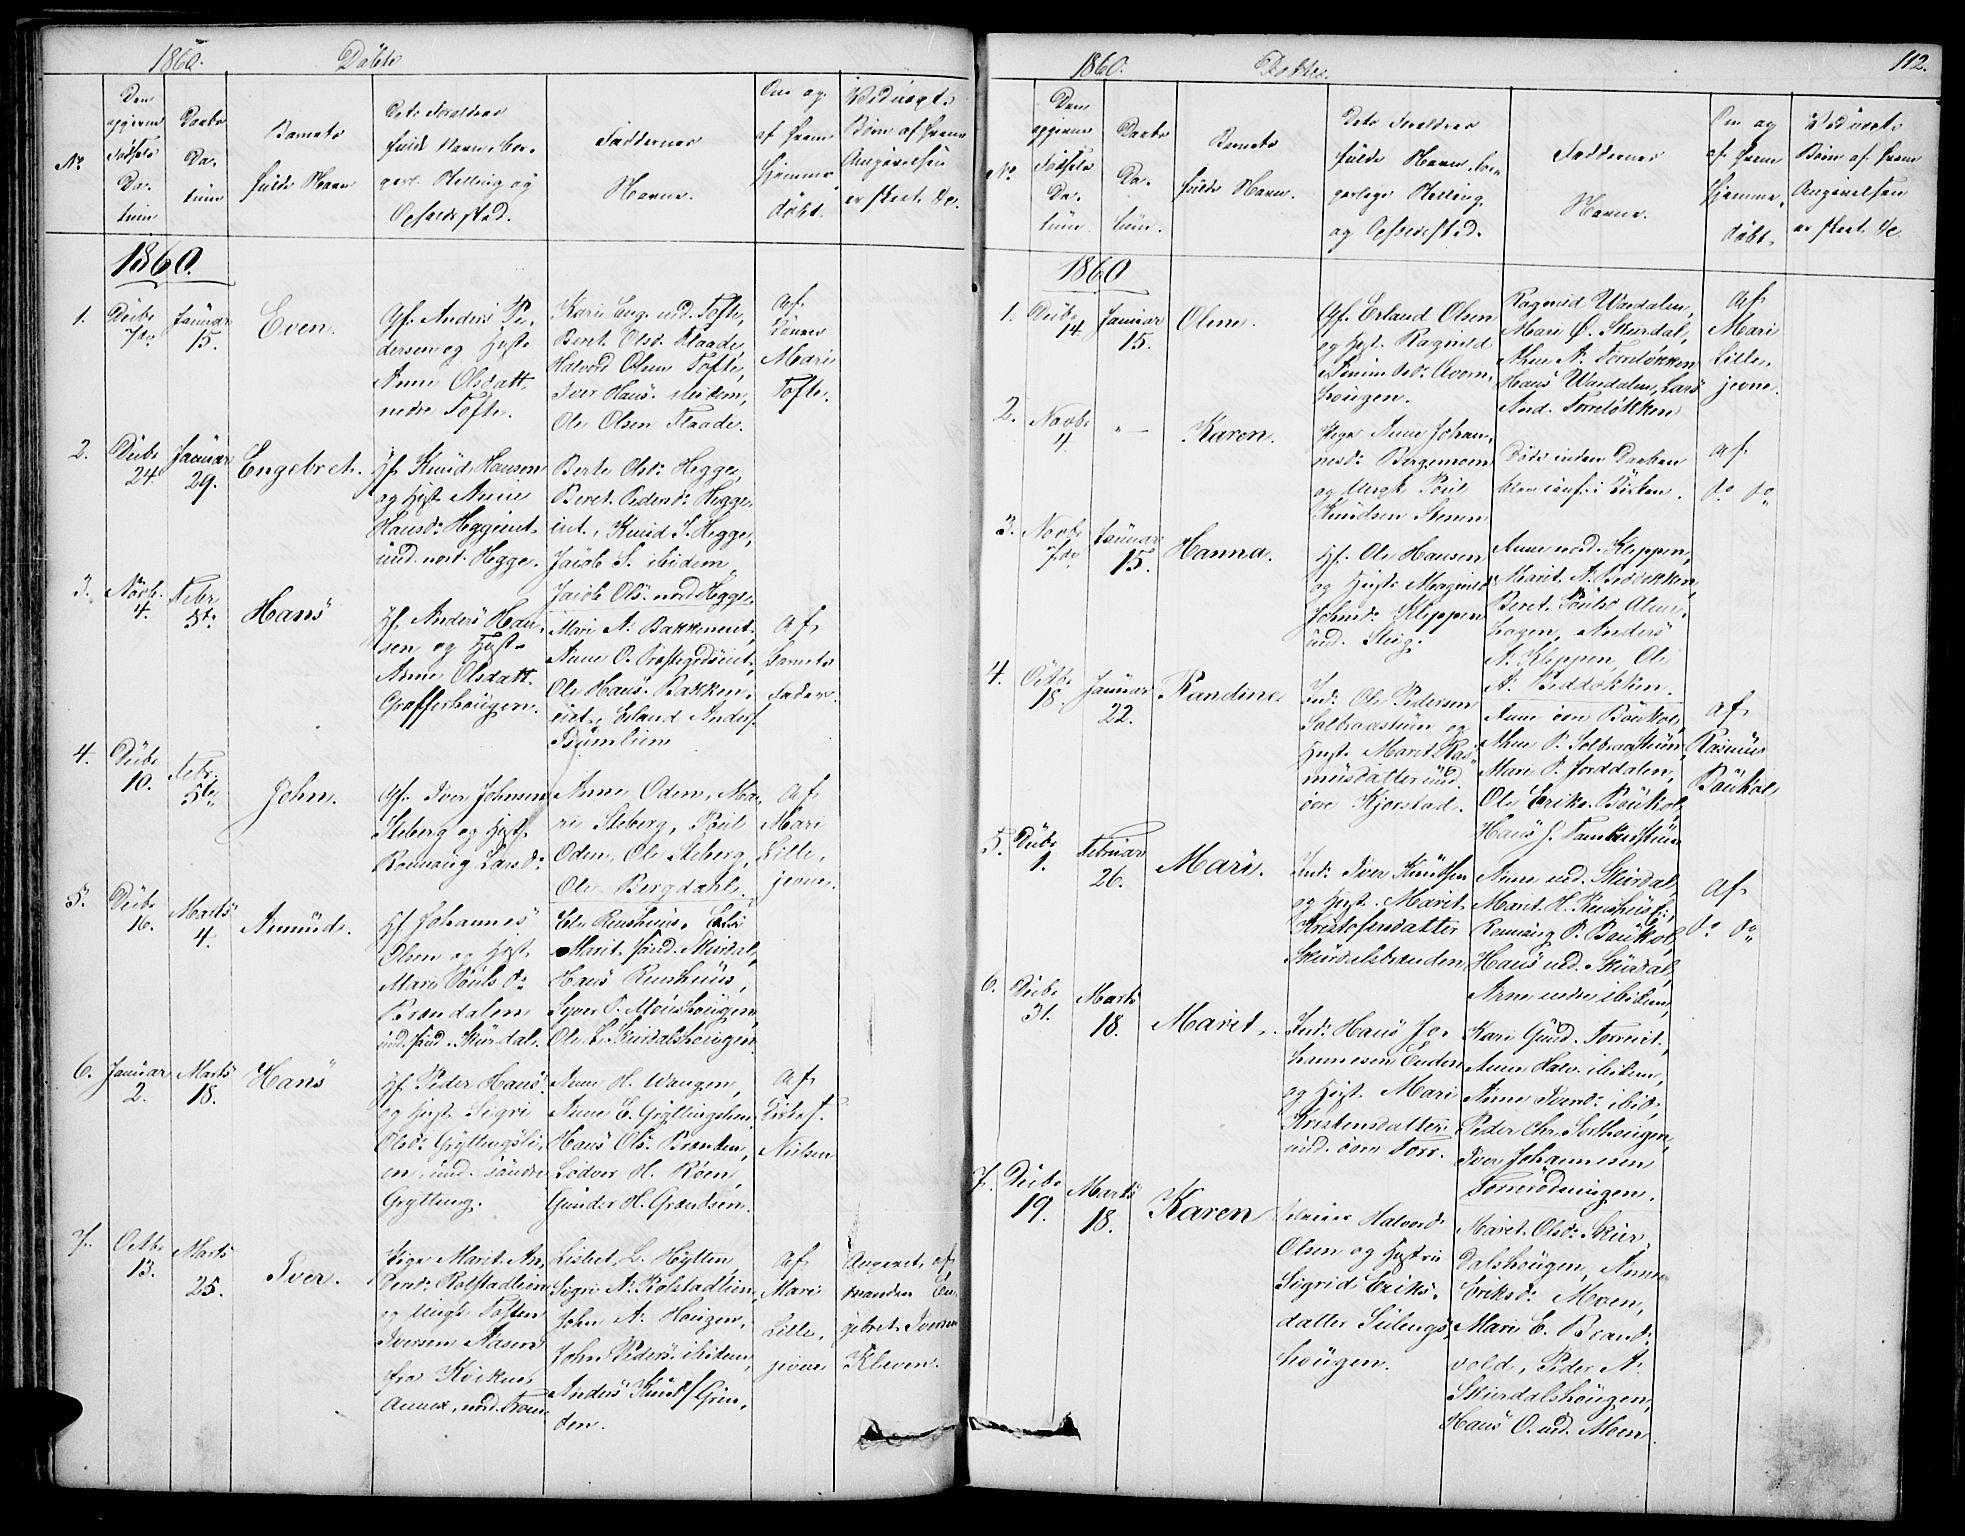 SAH, Sør-Fron prestekontor, H/Ha/Hab/L0001: Klokkerbok nr. 1, 1844-1863, s. 112